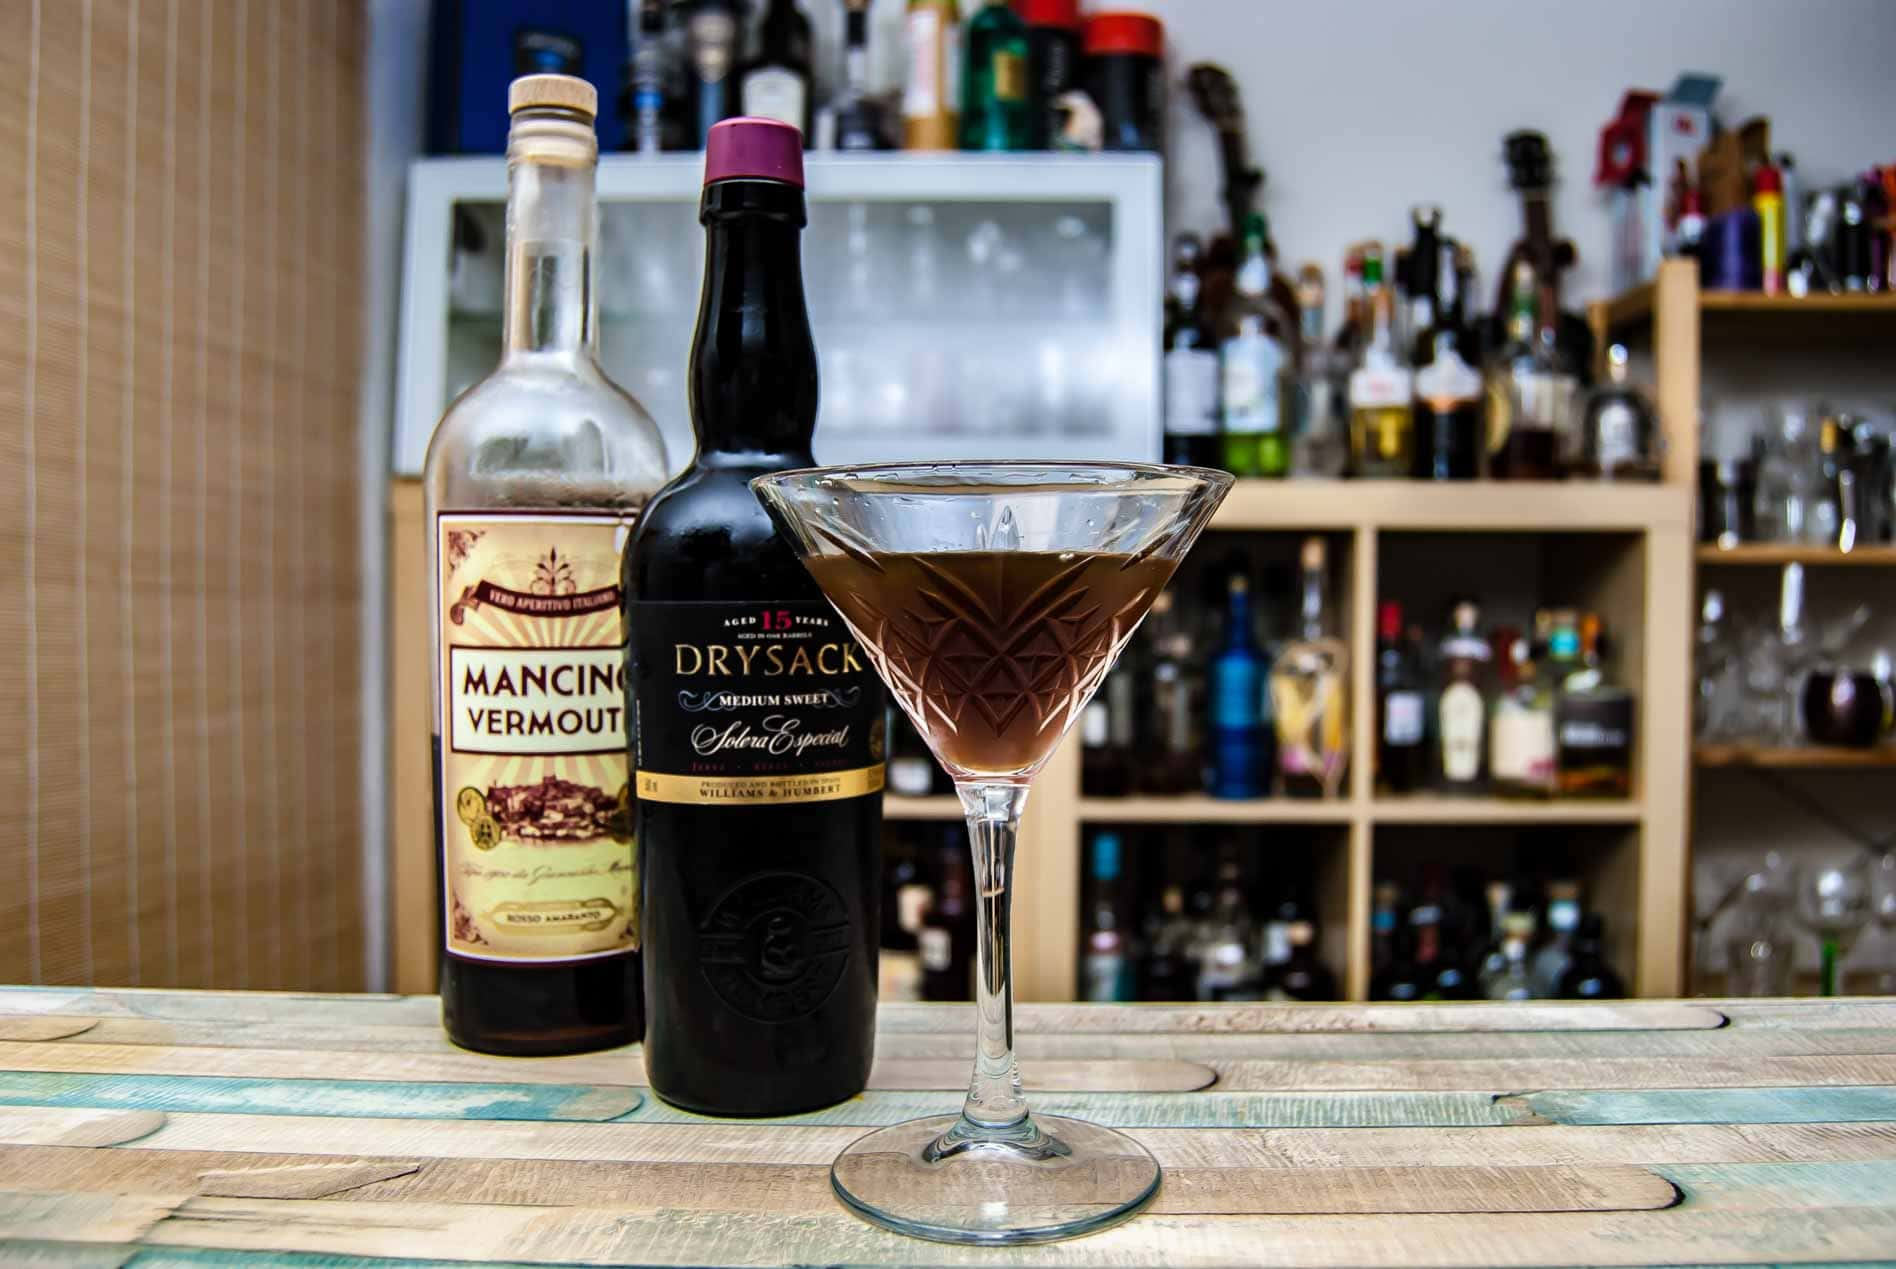 Williams & Humbert Drysack Medium Sweet Sherry in einem Adonis Cocktail mit Mancino Vermouth Rosso.